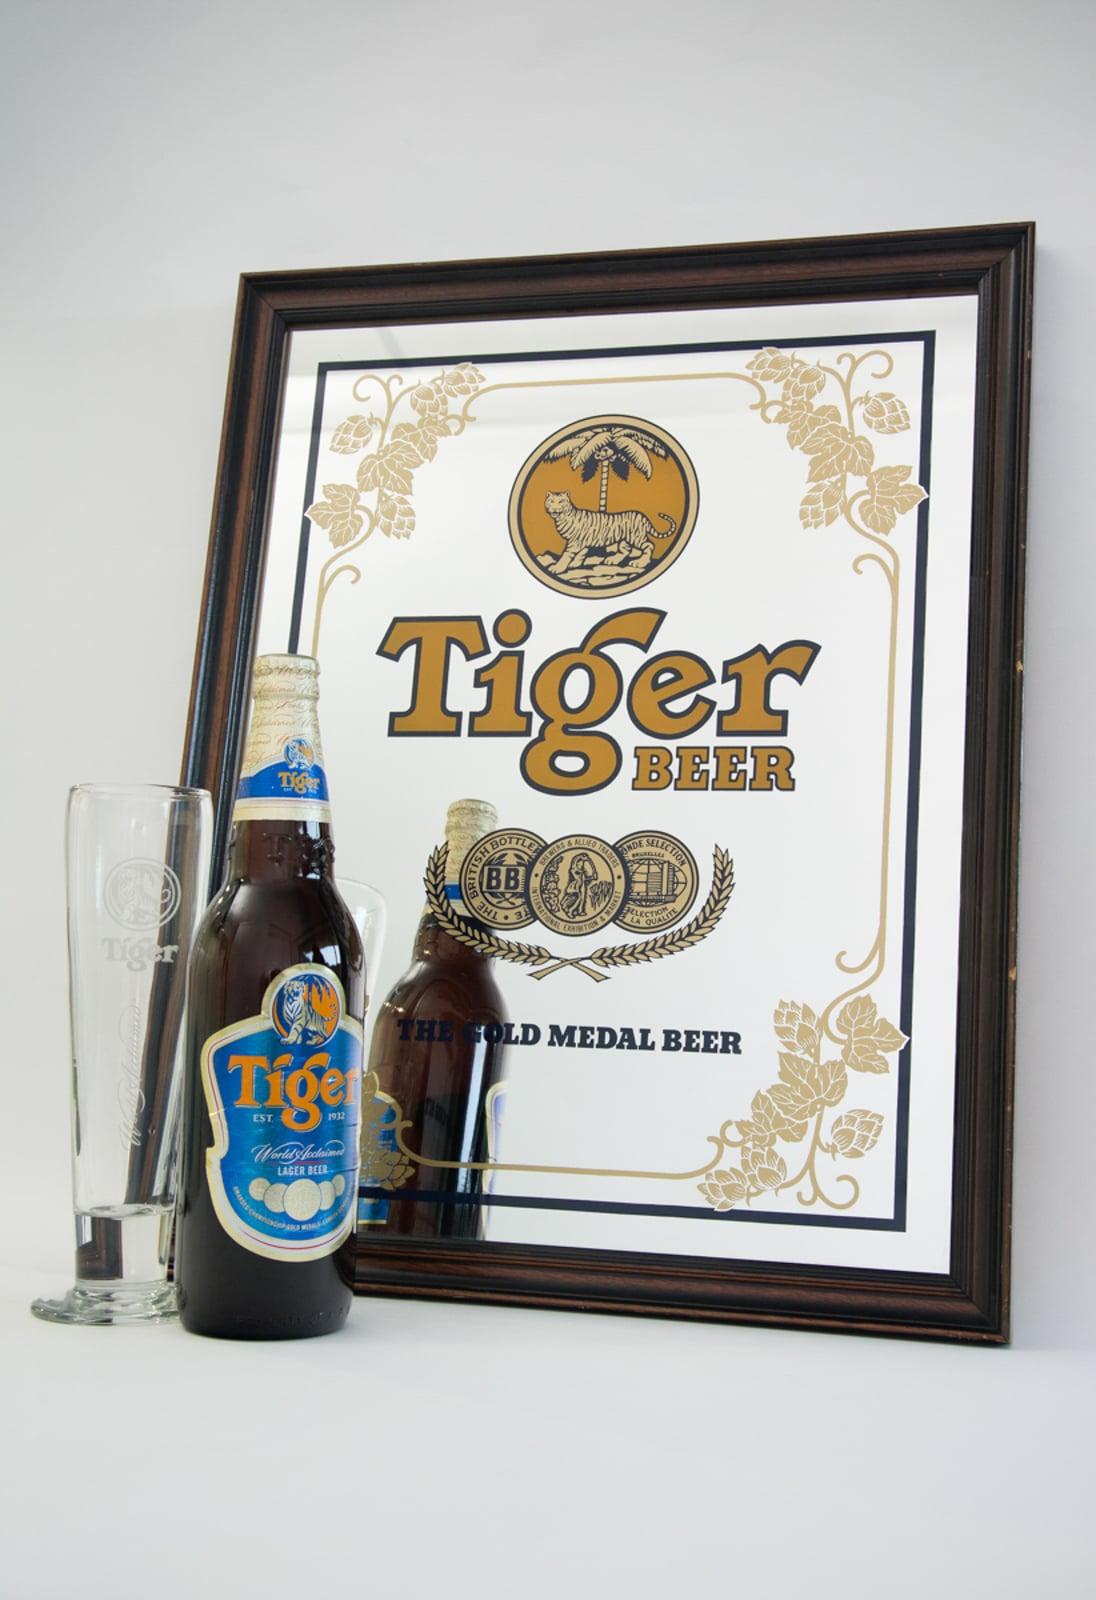 Tiger Beer: The Gold Medal Beer Mirror